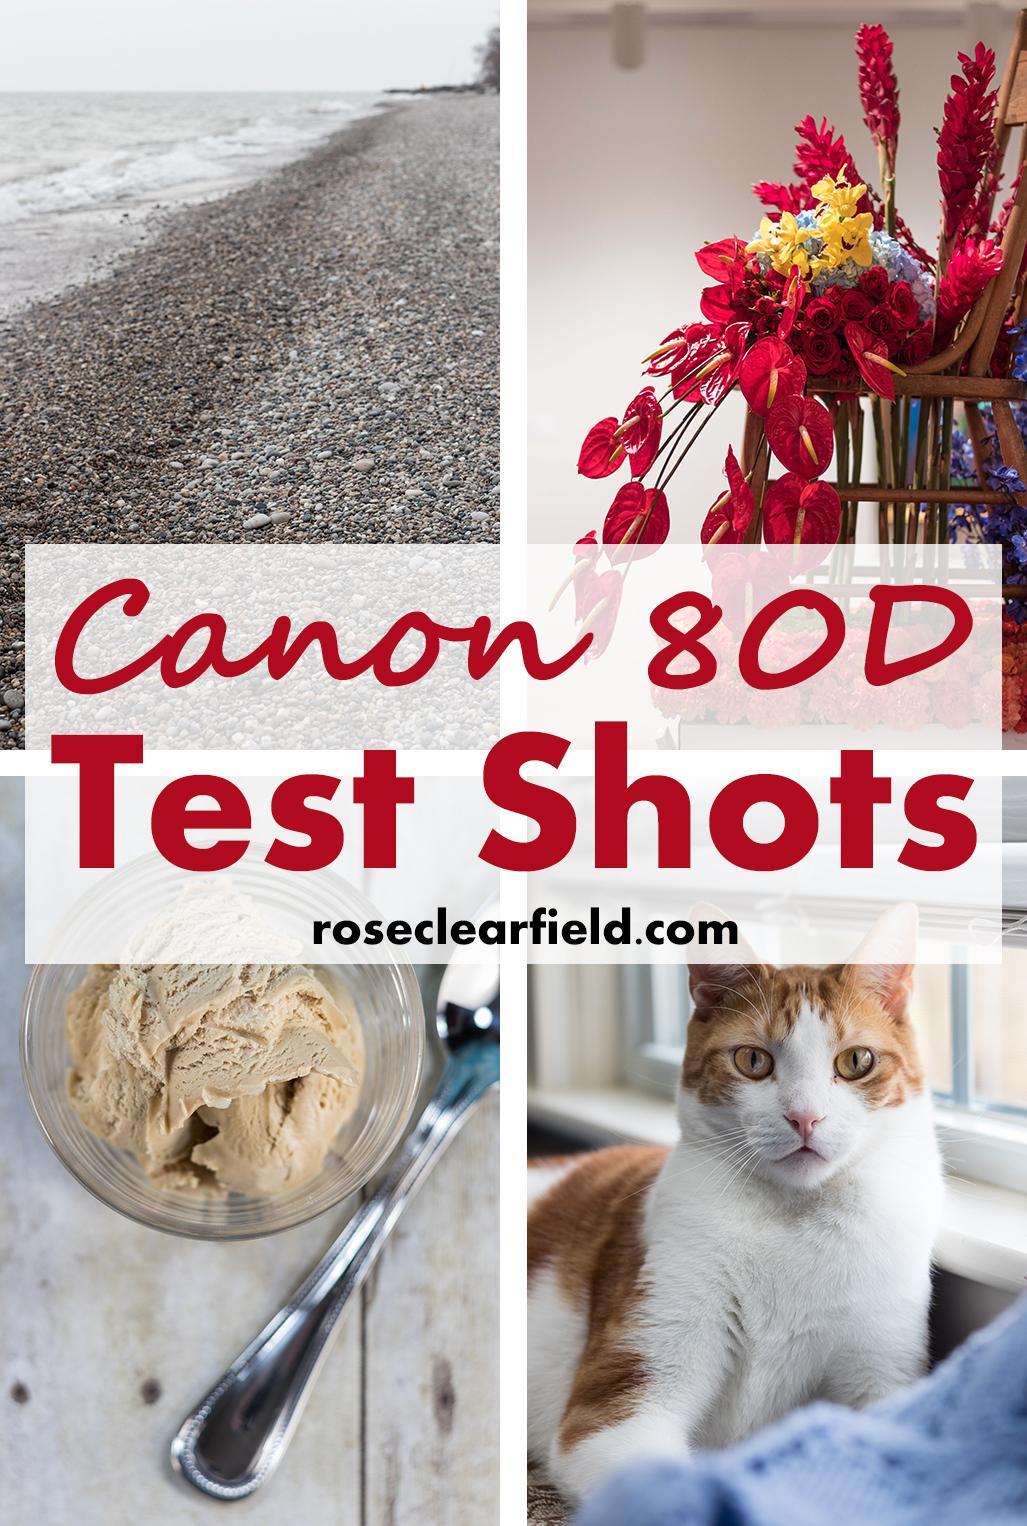 Canon 80D Test Shots | https://www.roseclearfield.com